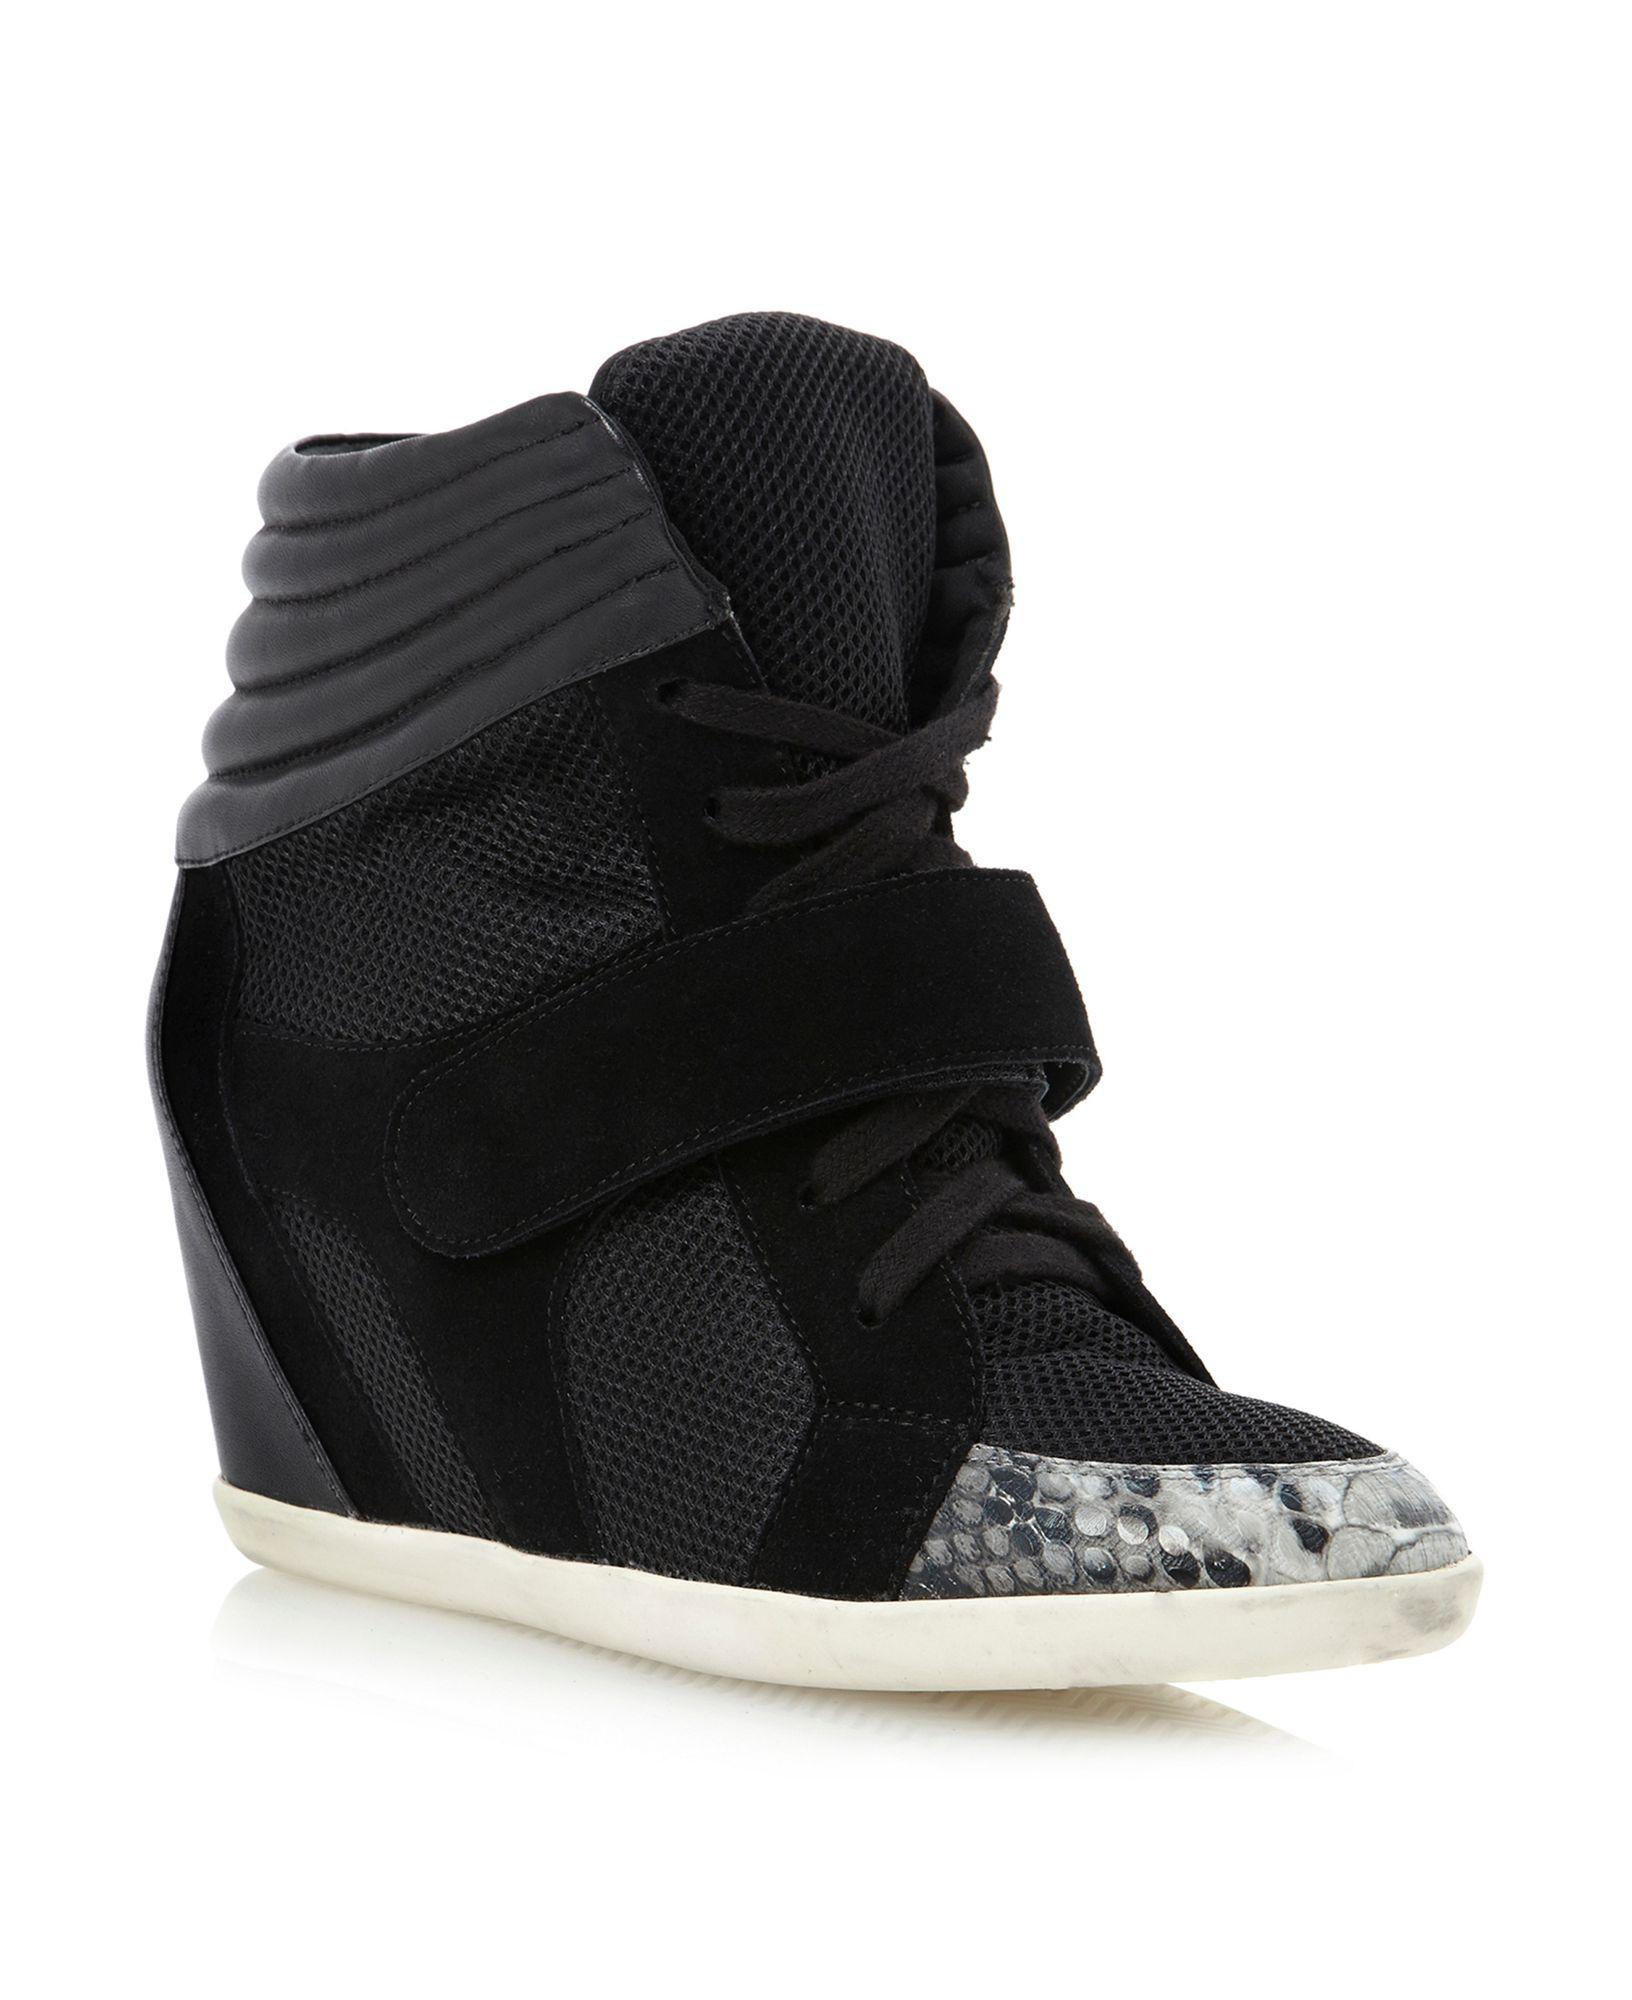 dune lennox snake toe sports wedge shoes in black black